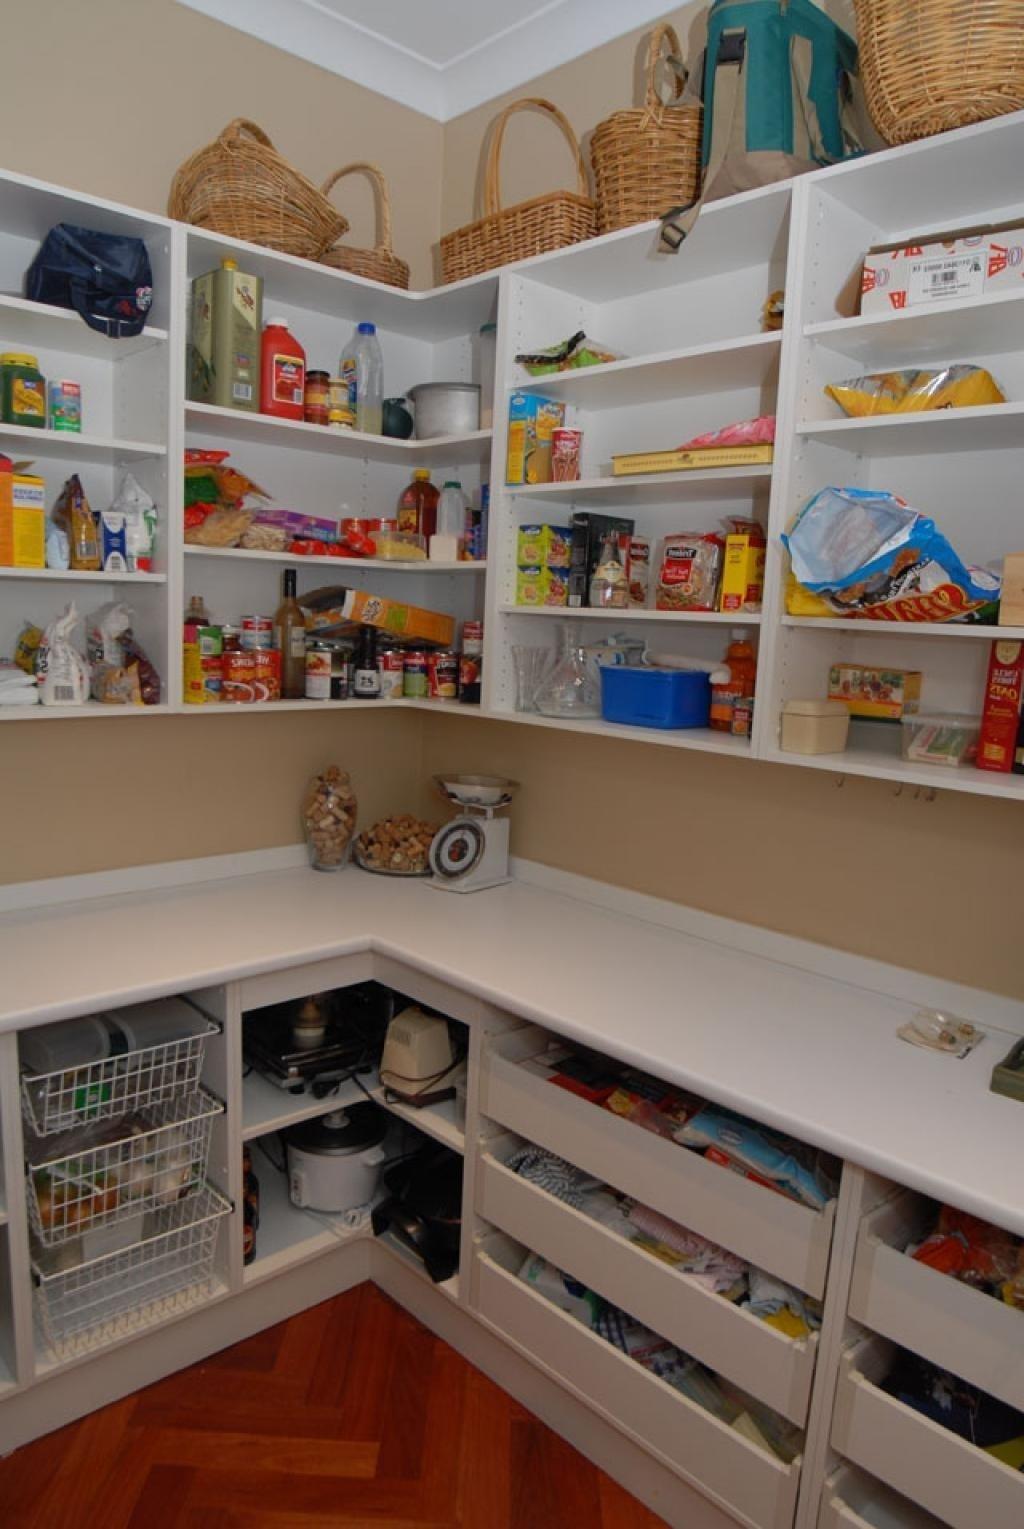 10 Cute Walk In Pantry Design Ideas walk in pantry design small quickinfoway interior ideas luxury 2021